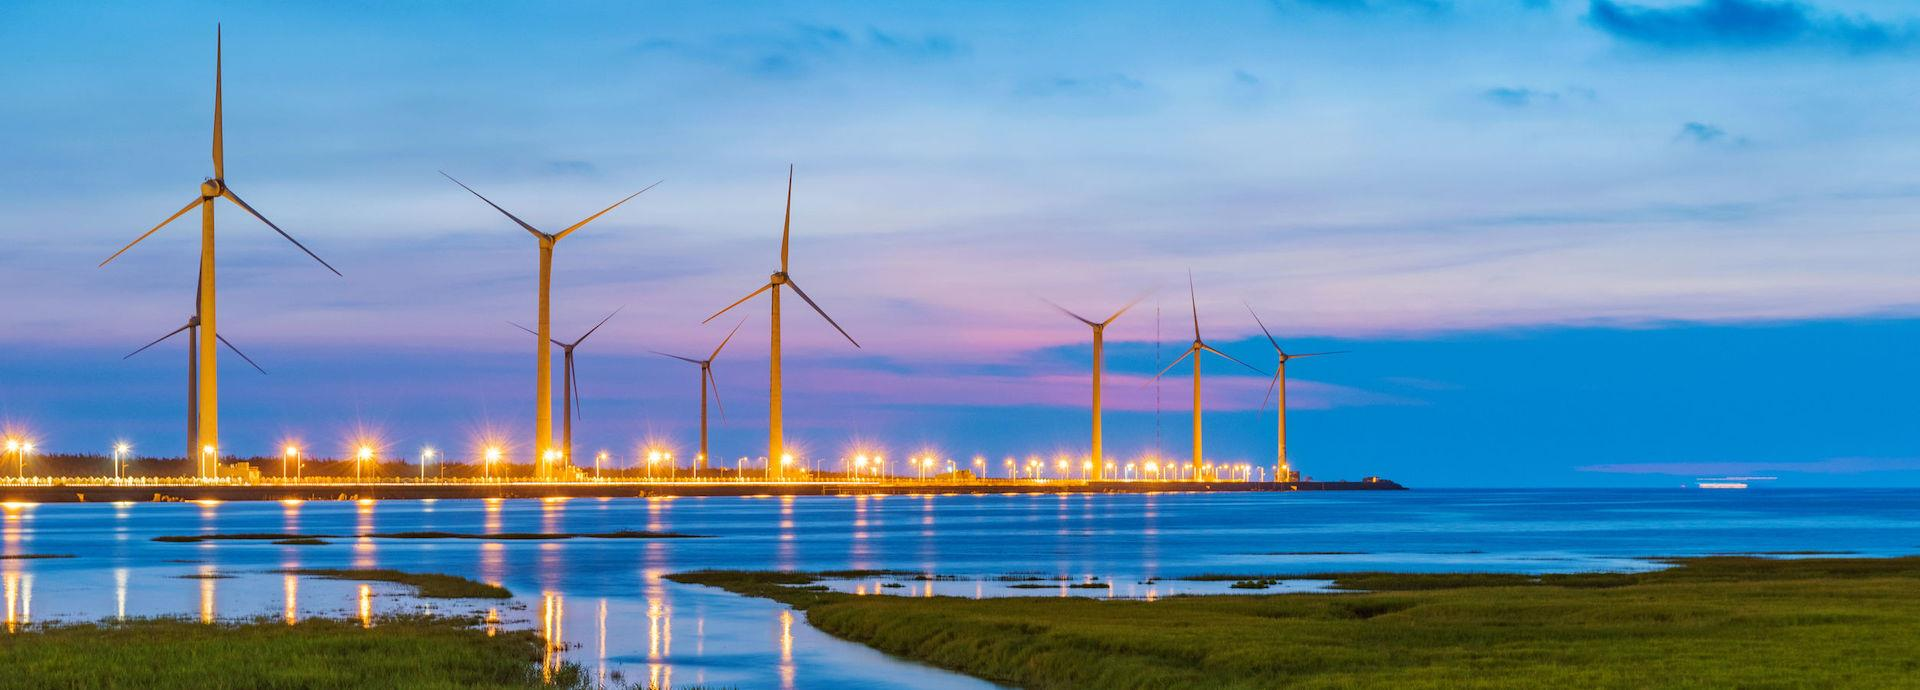 windfarm at night